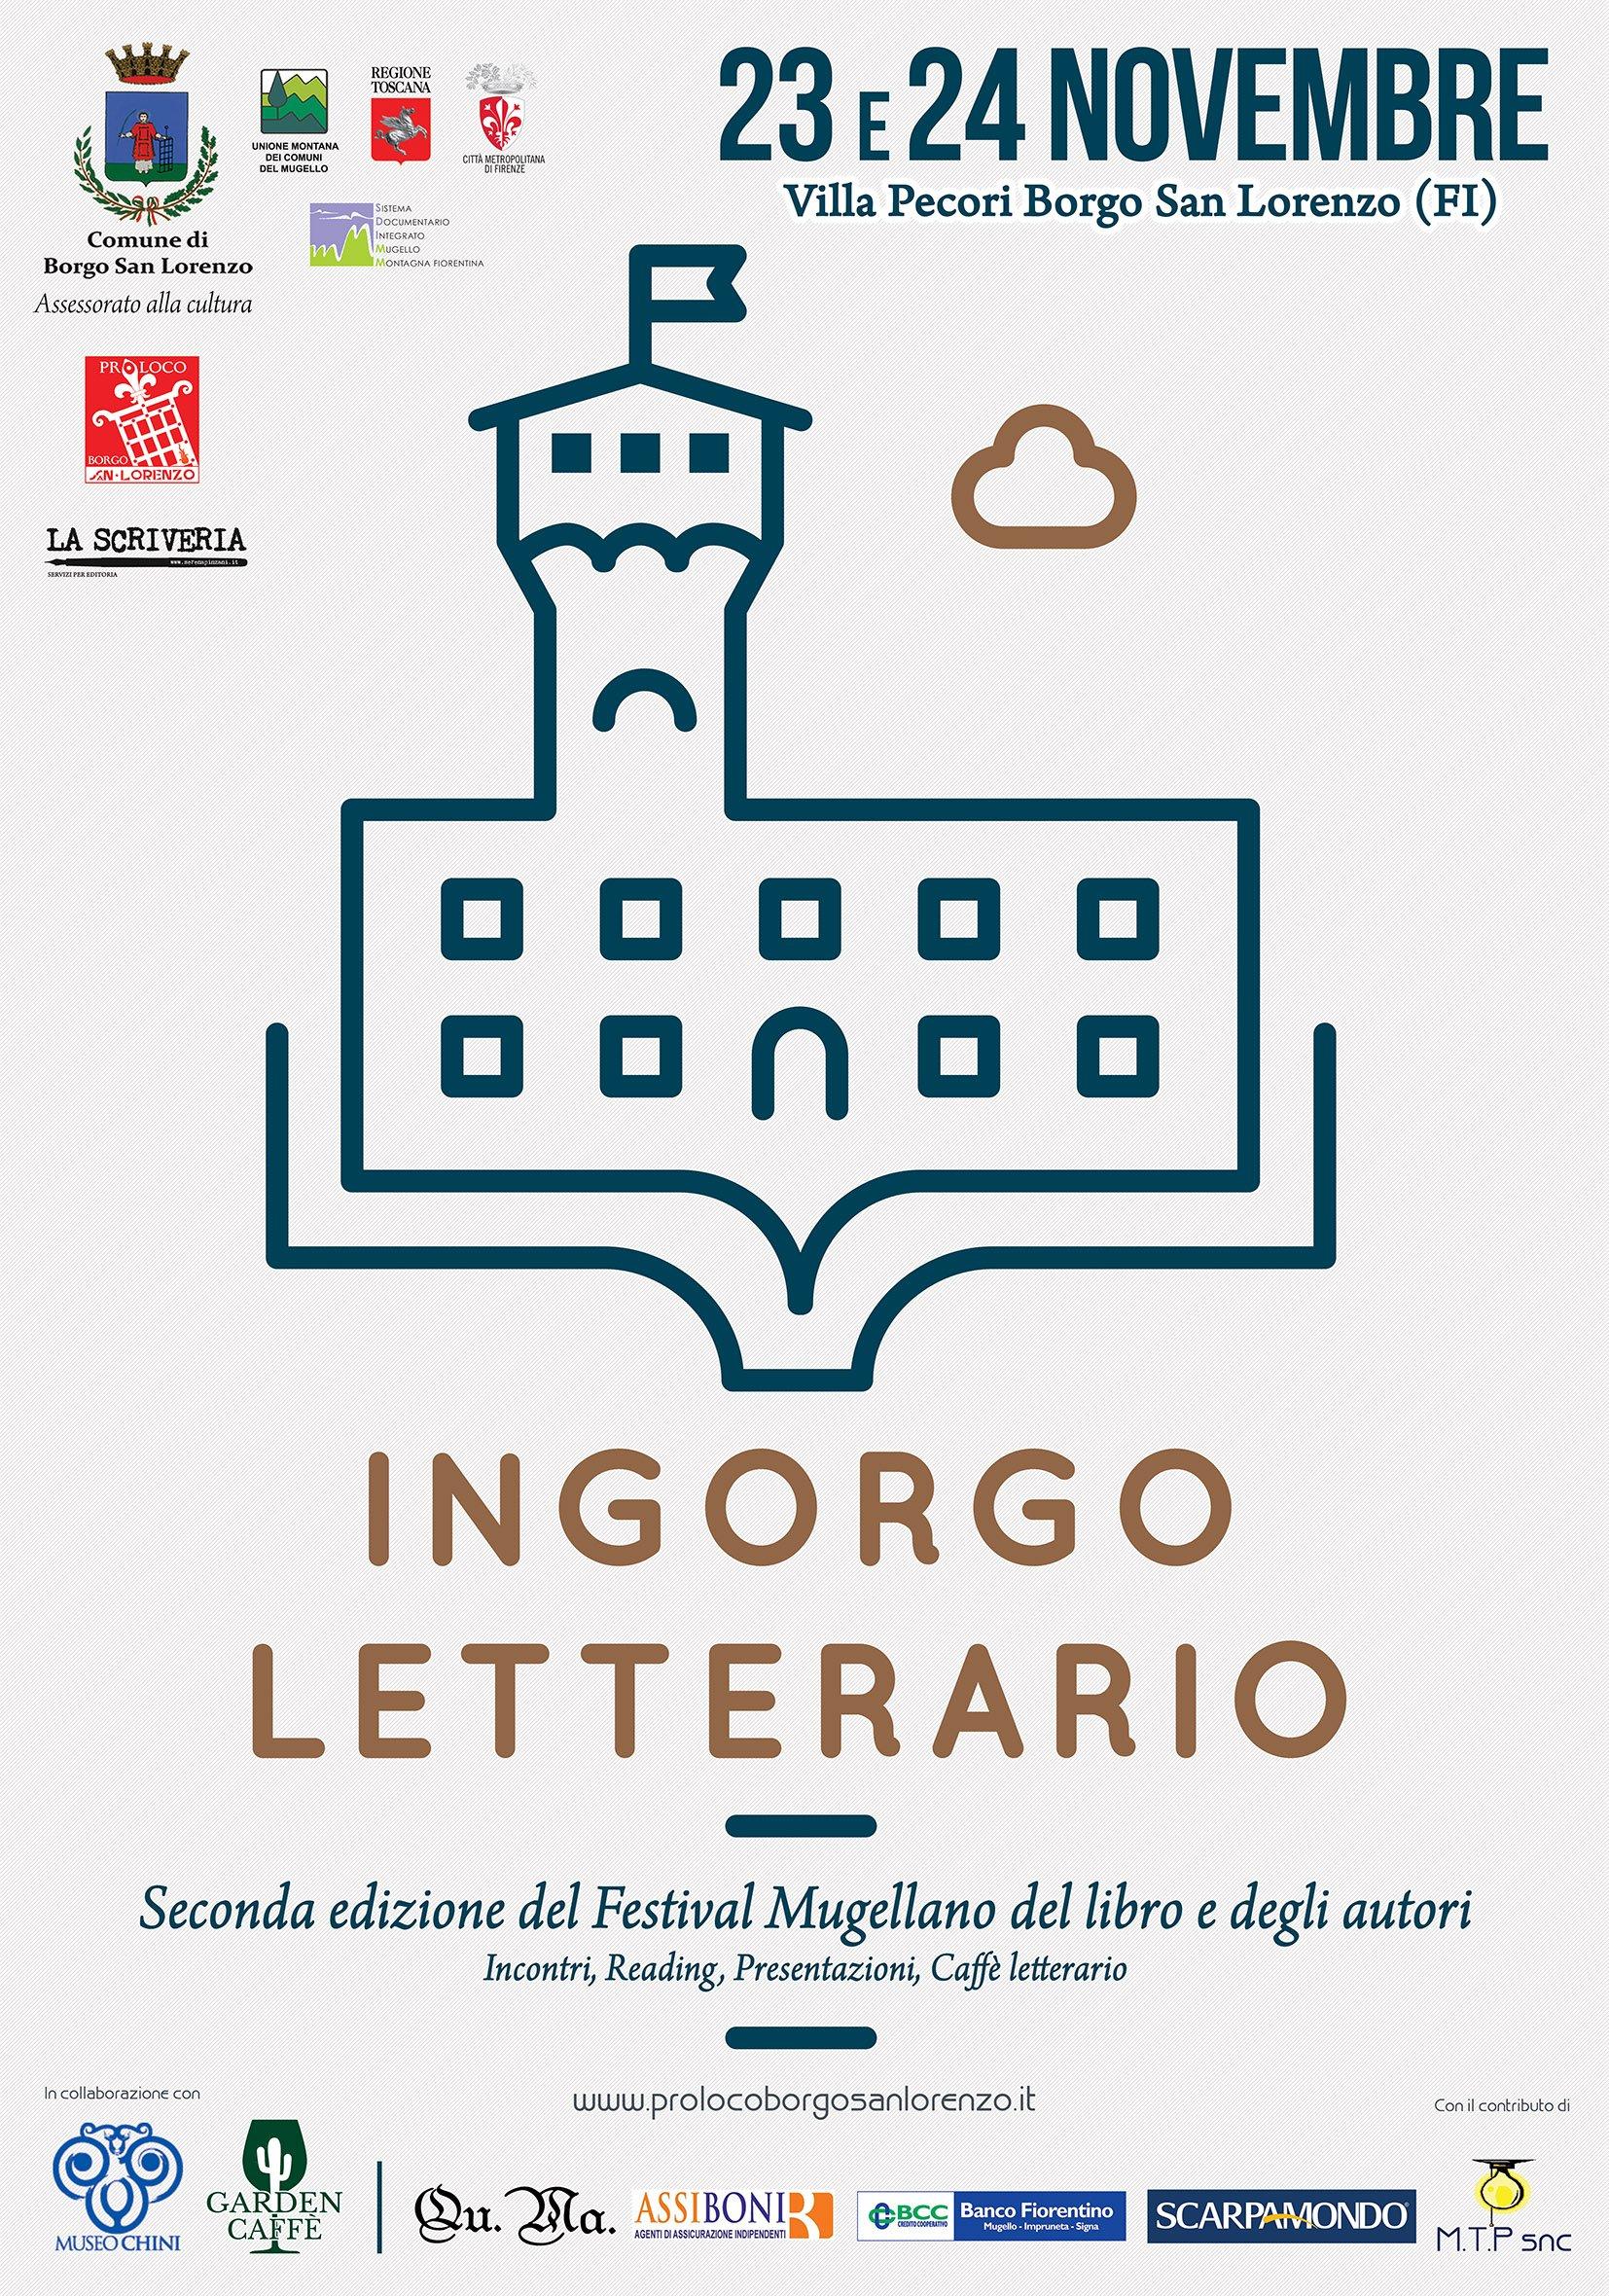 Ingorgo Letterario 2019 VP